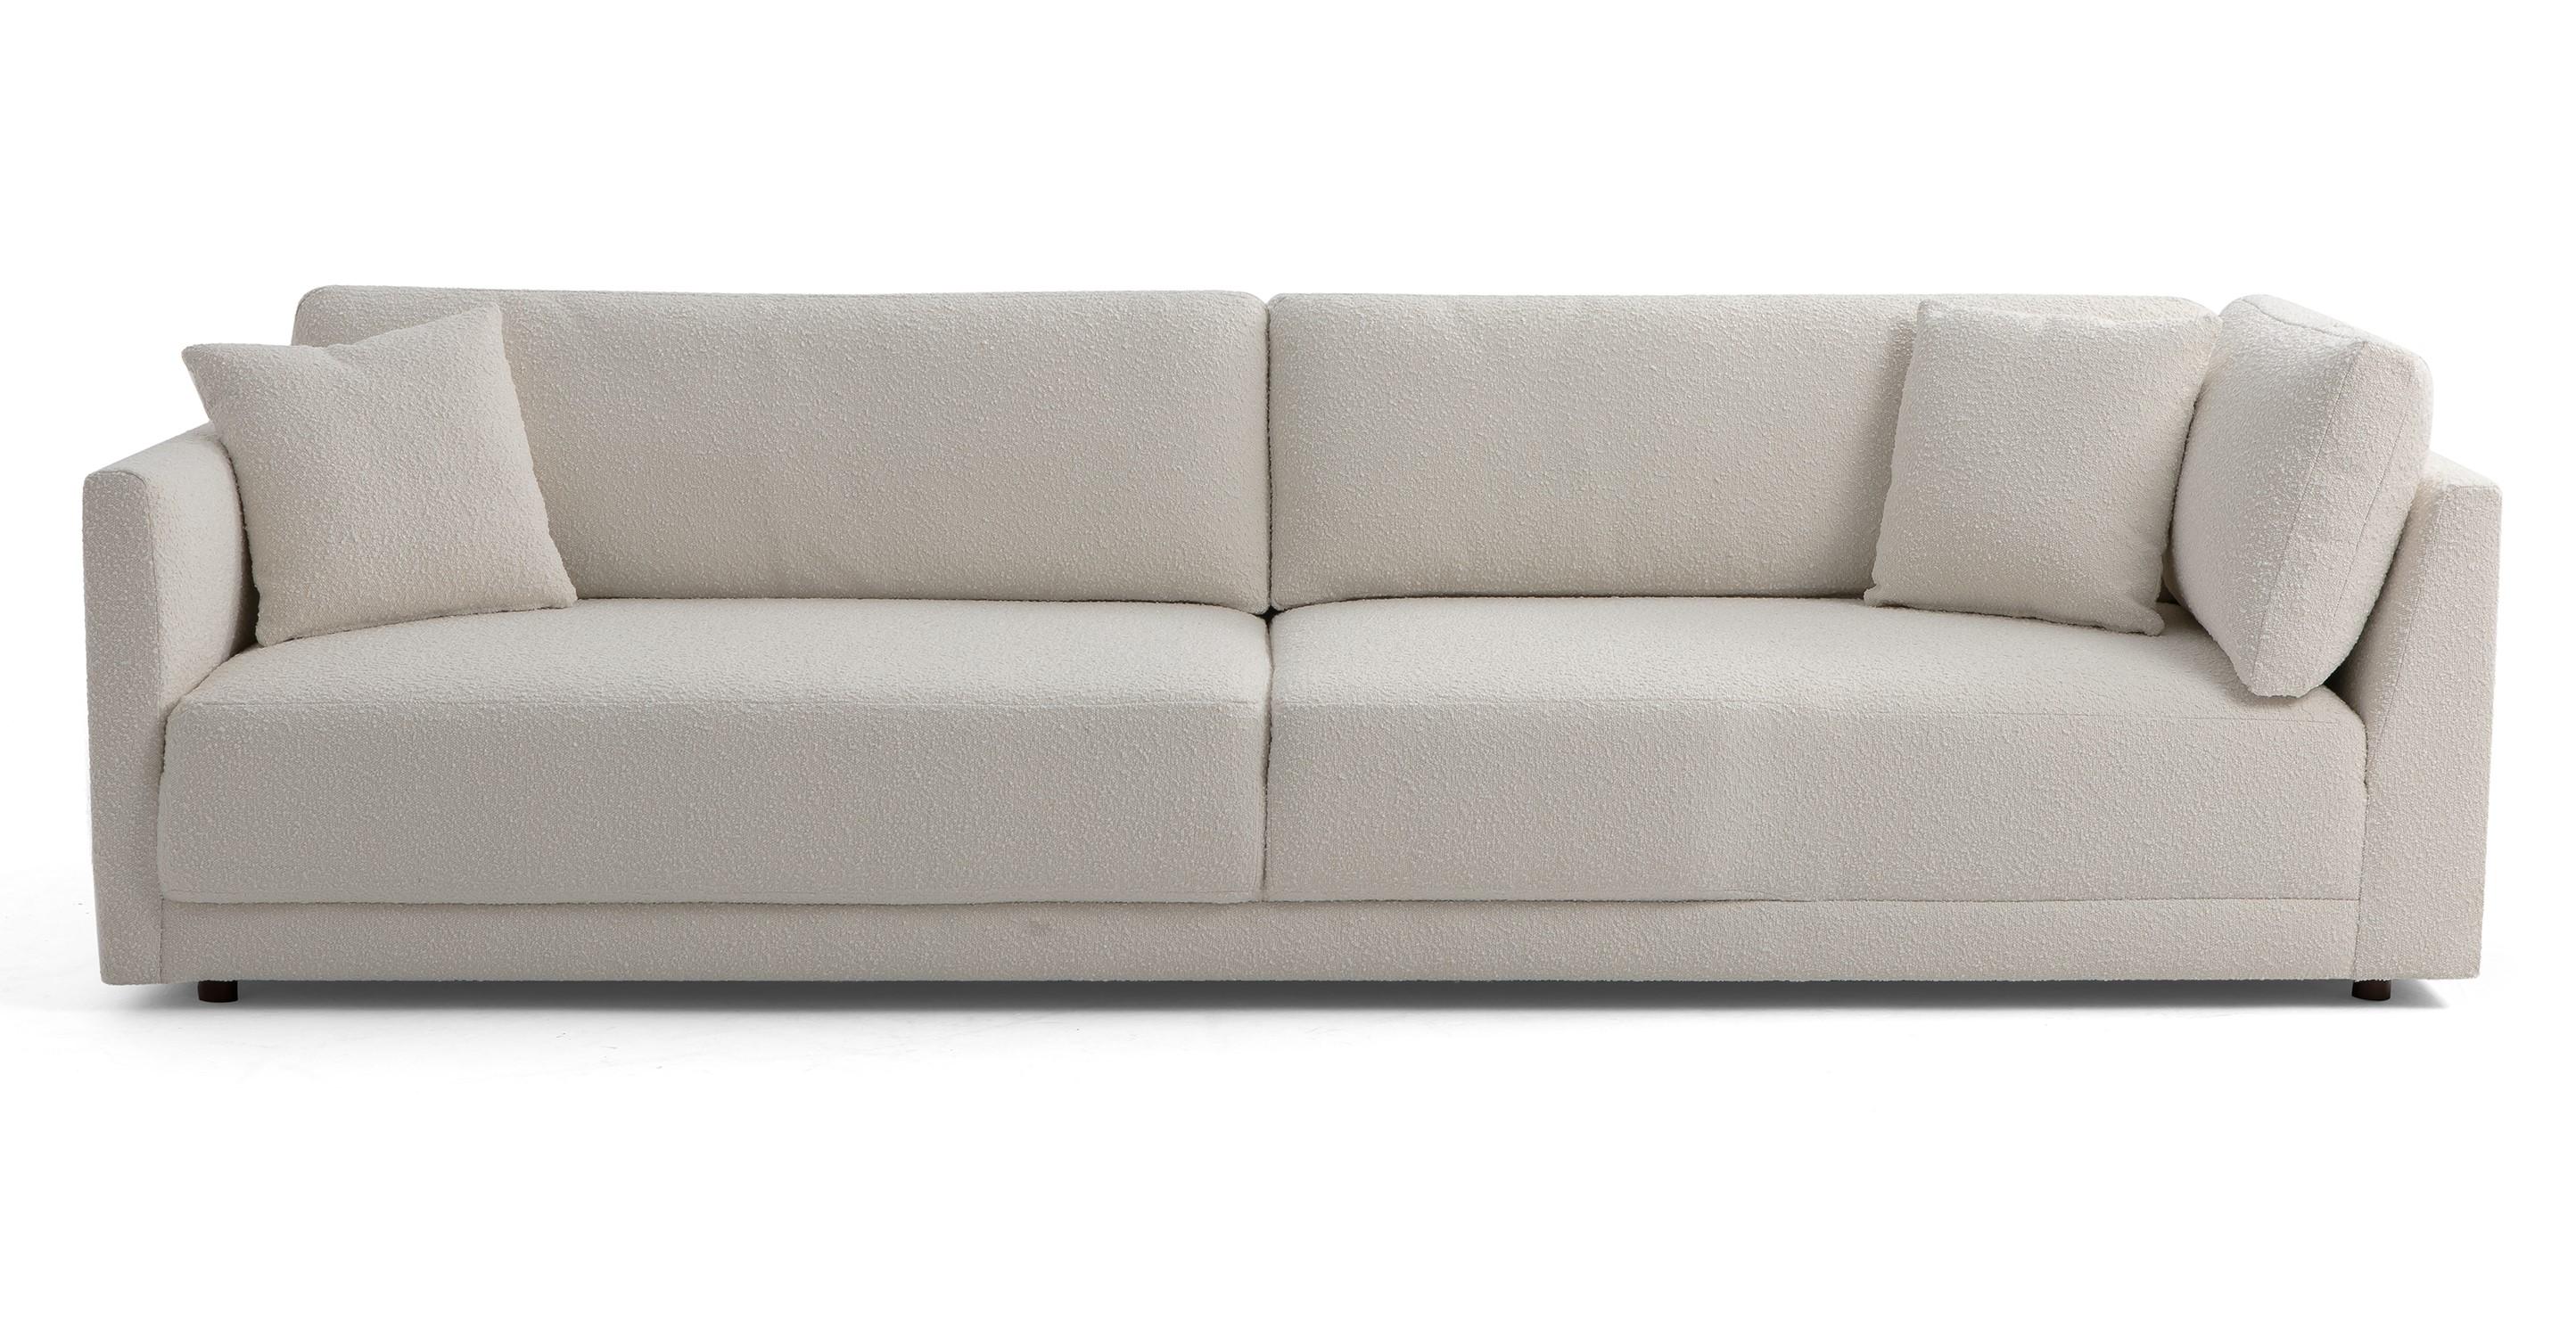 "Domus 114"" Fabric Sofa Lounge Arm Right, Blanc Boucle"